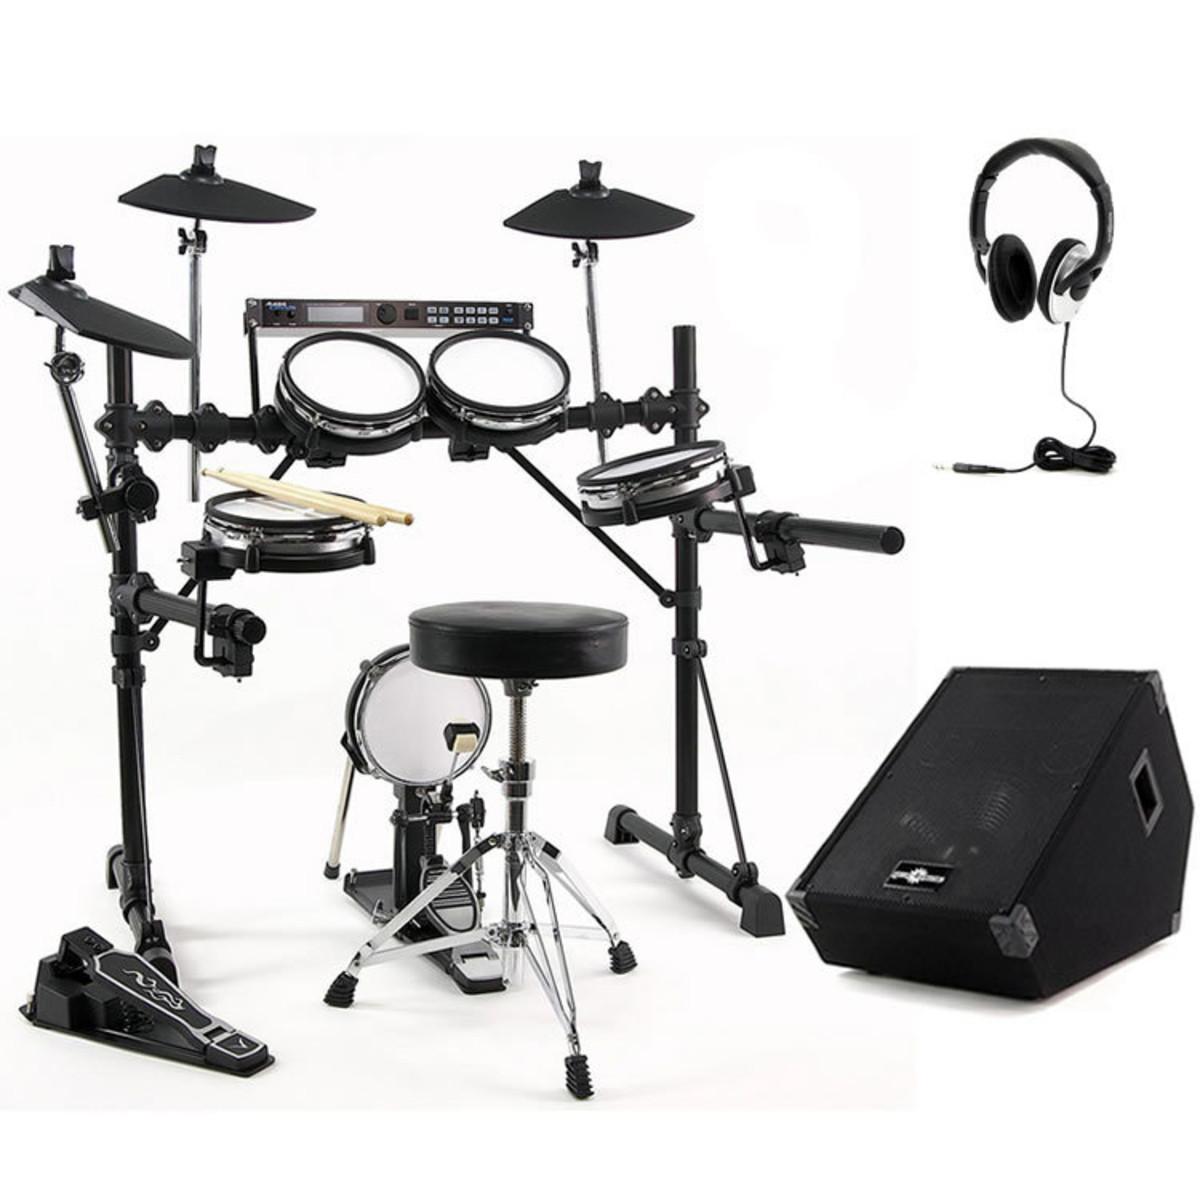 Alesis DM5 Pro Drum Kit & 150W Amp Pack